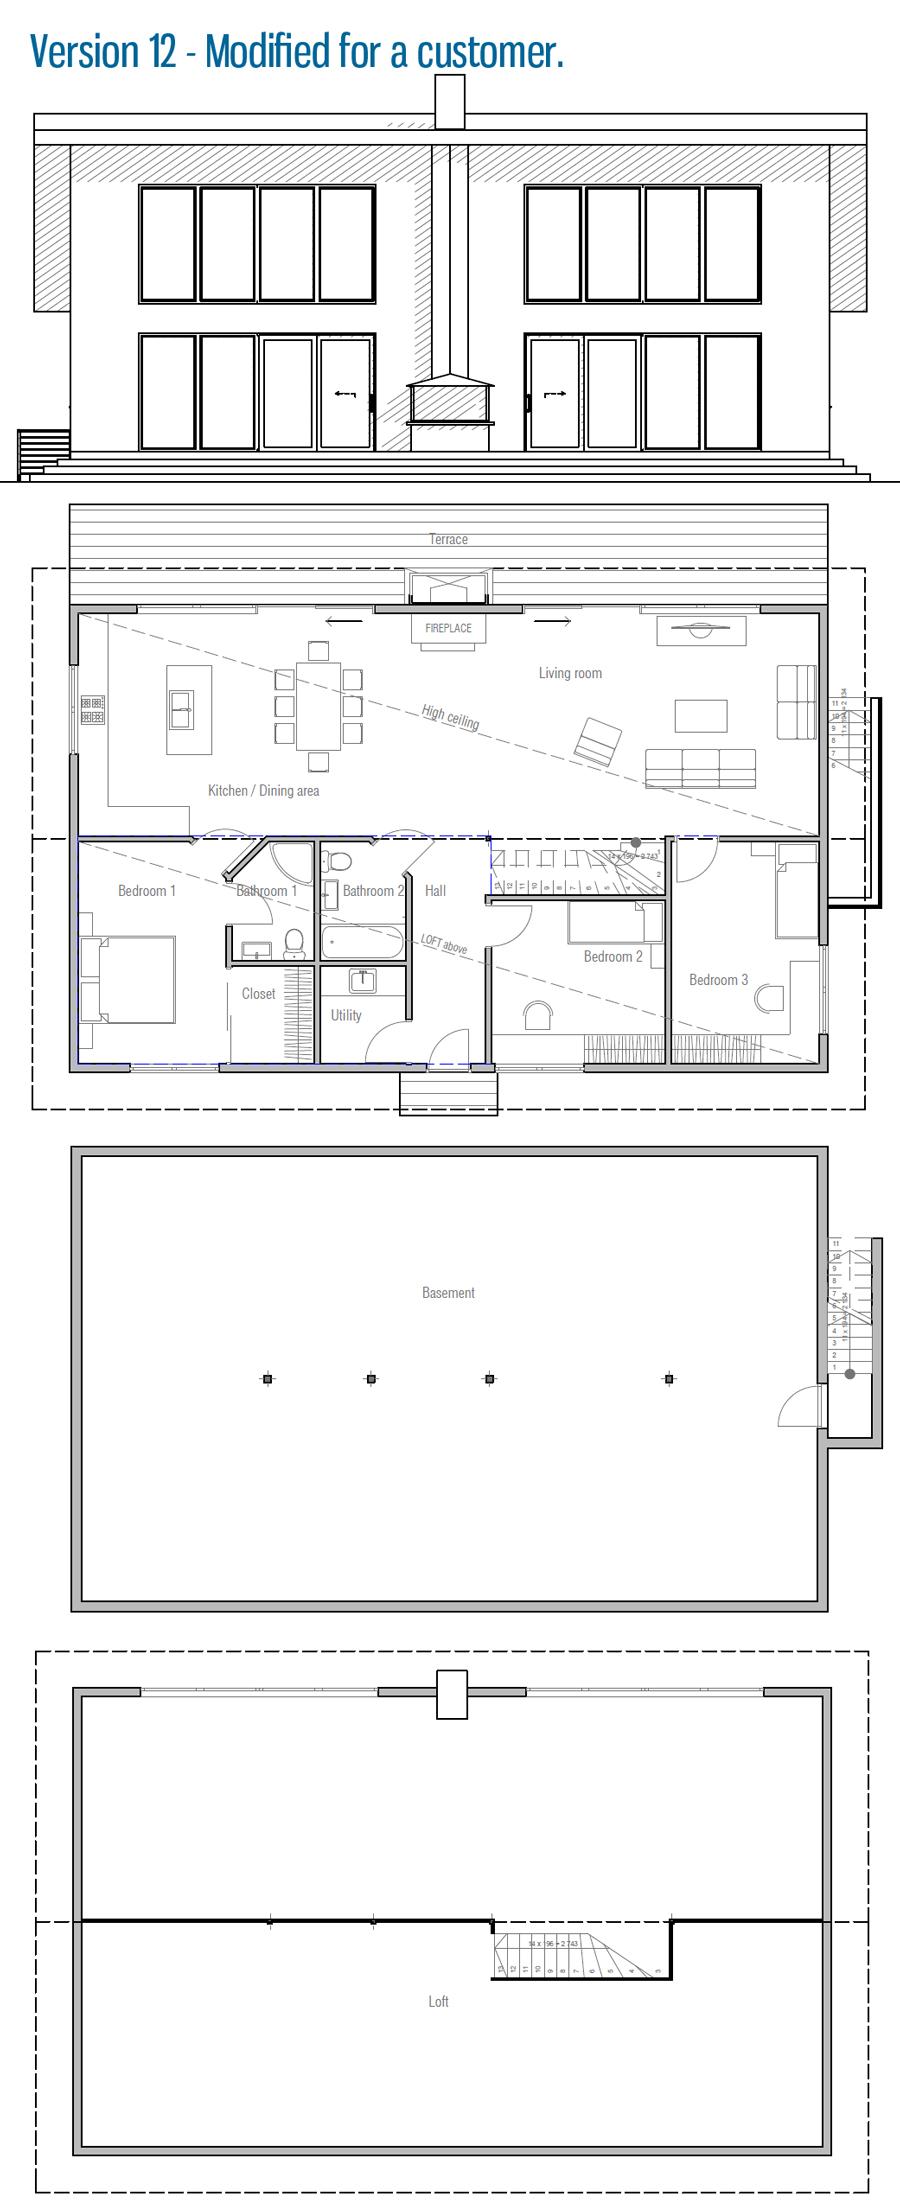 affordable-homes_50_HOUSE_PLAN_CH61_V12.jpg